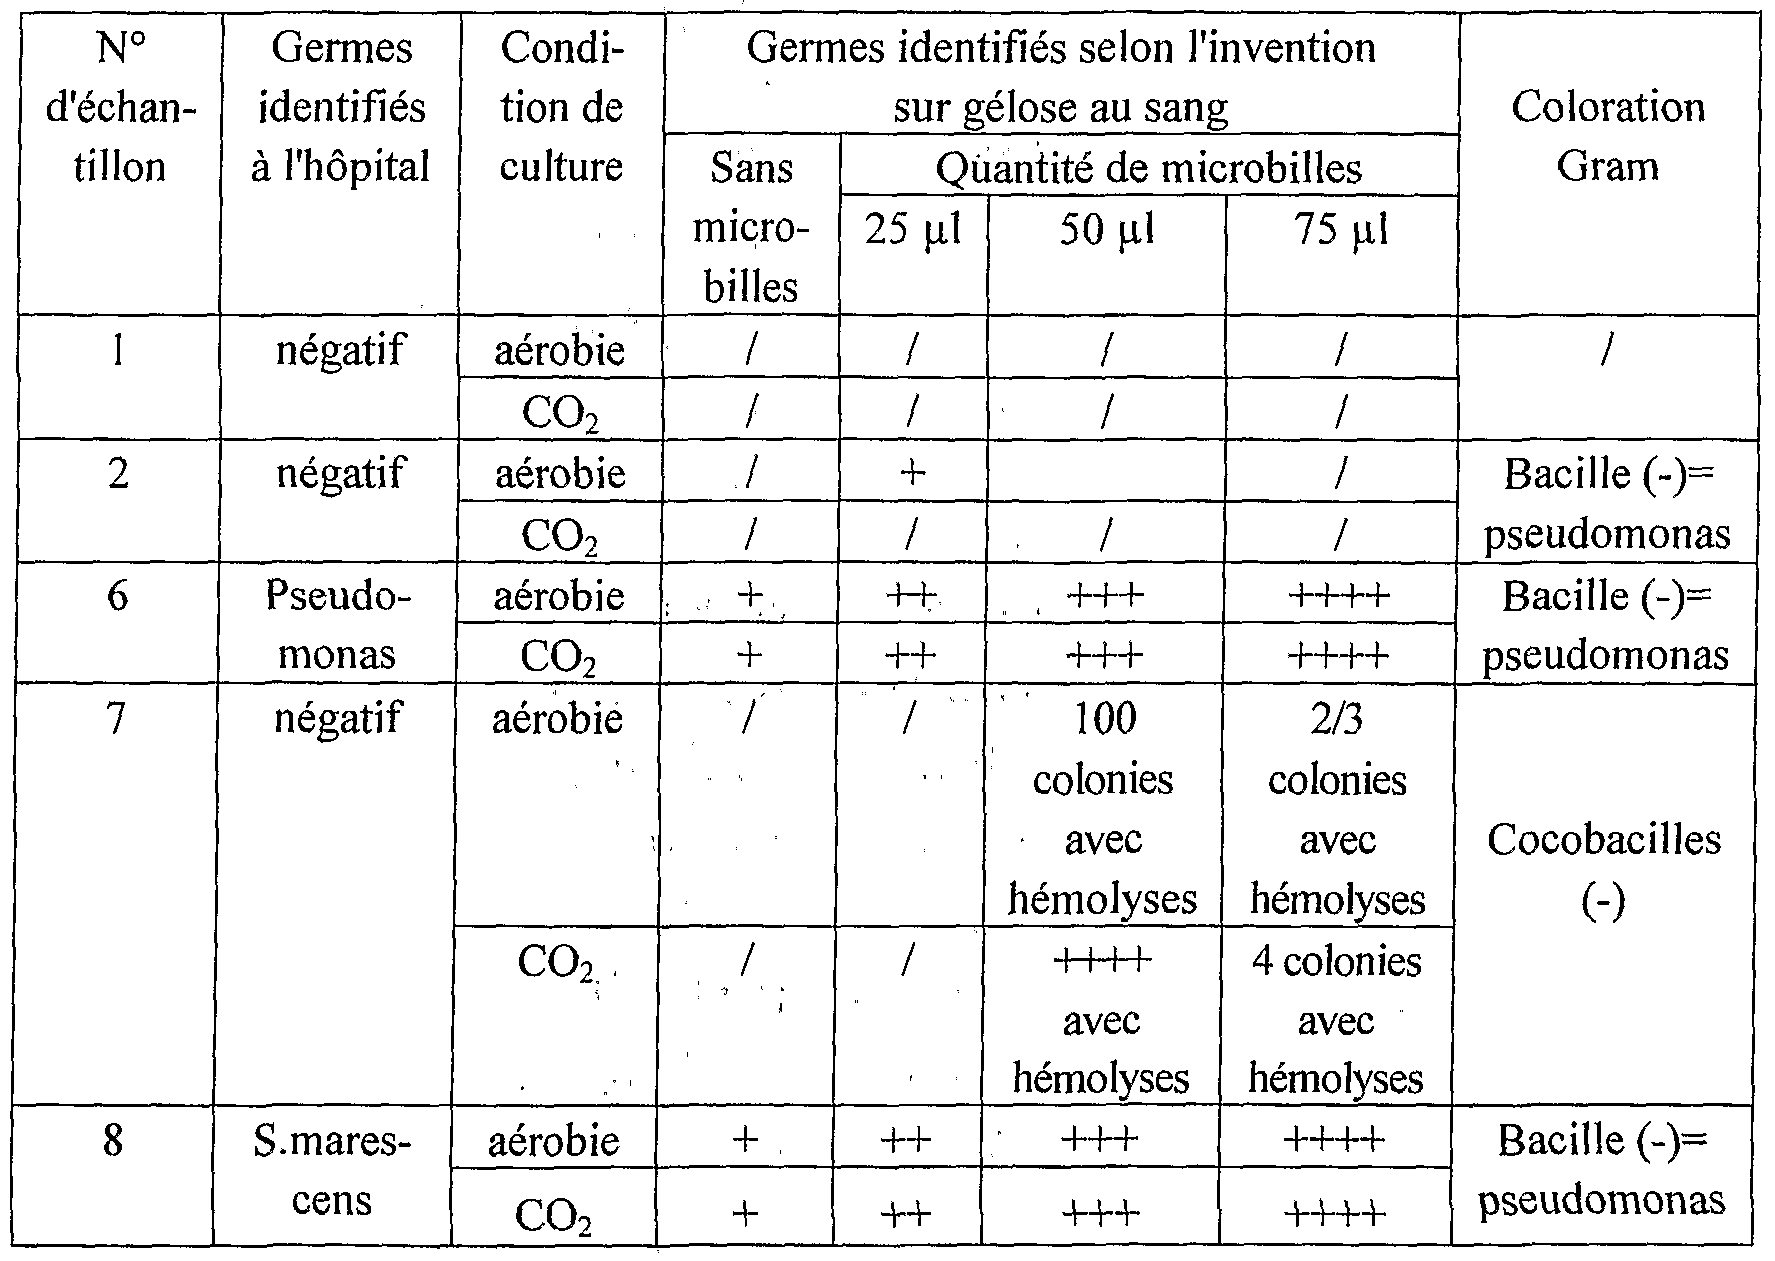 figure imgf000015_0001 - Coloration De Gram Protocole